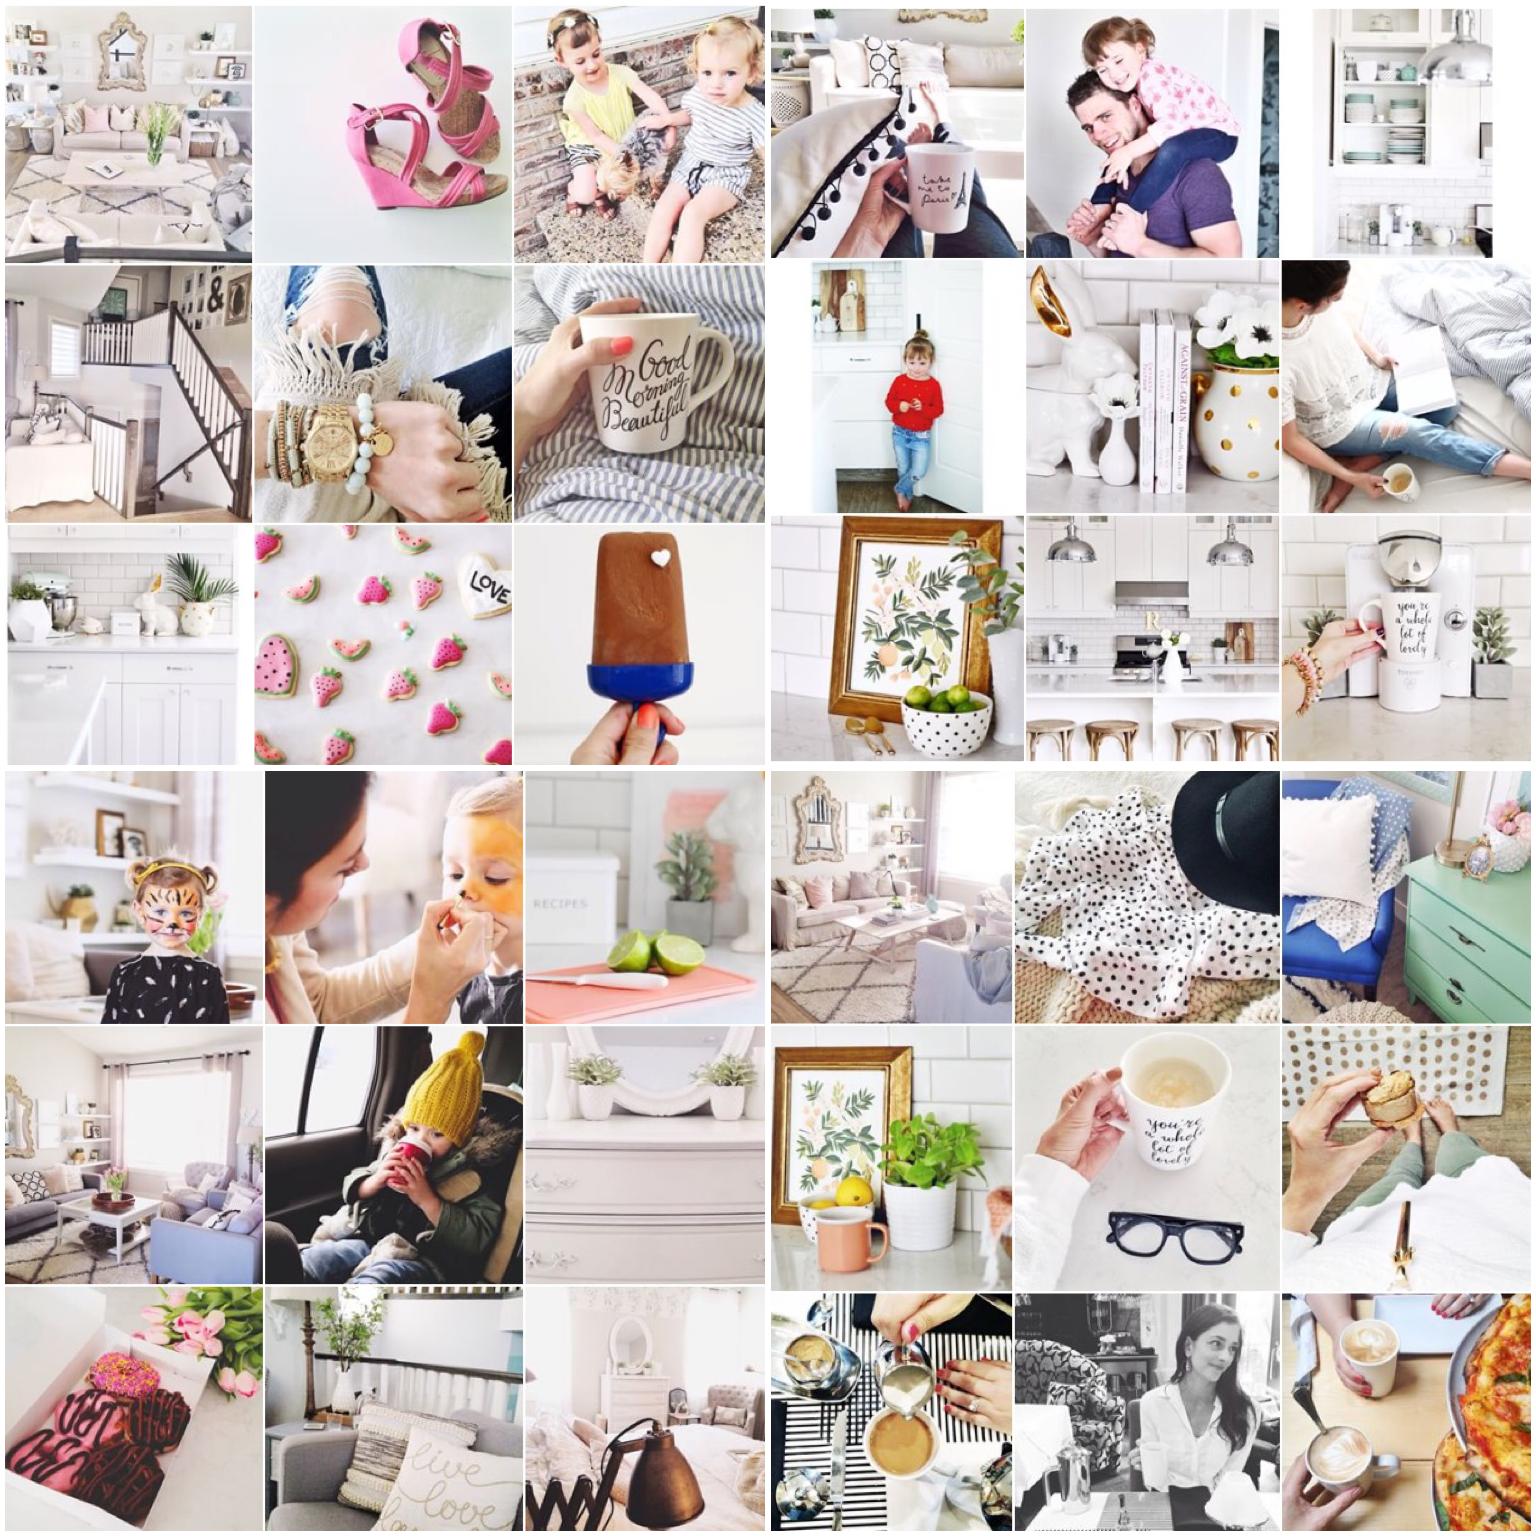 Oh My Dear Blog and @ohmydearhandmade instagram account